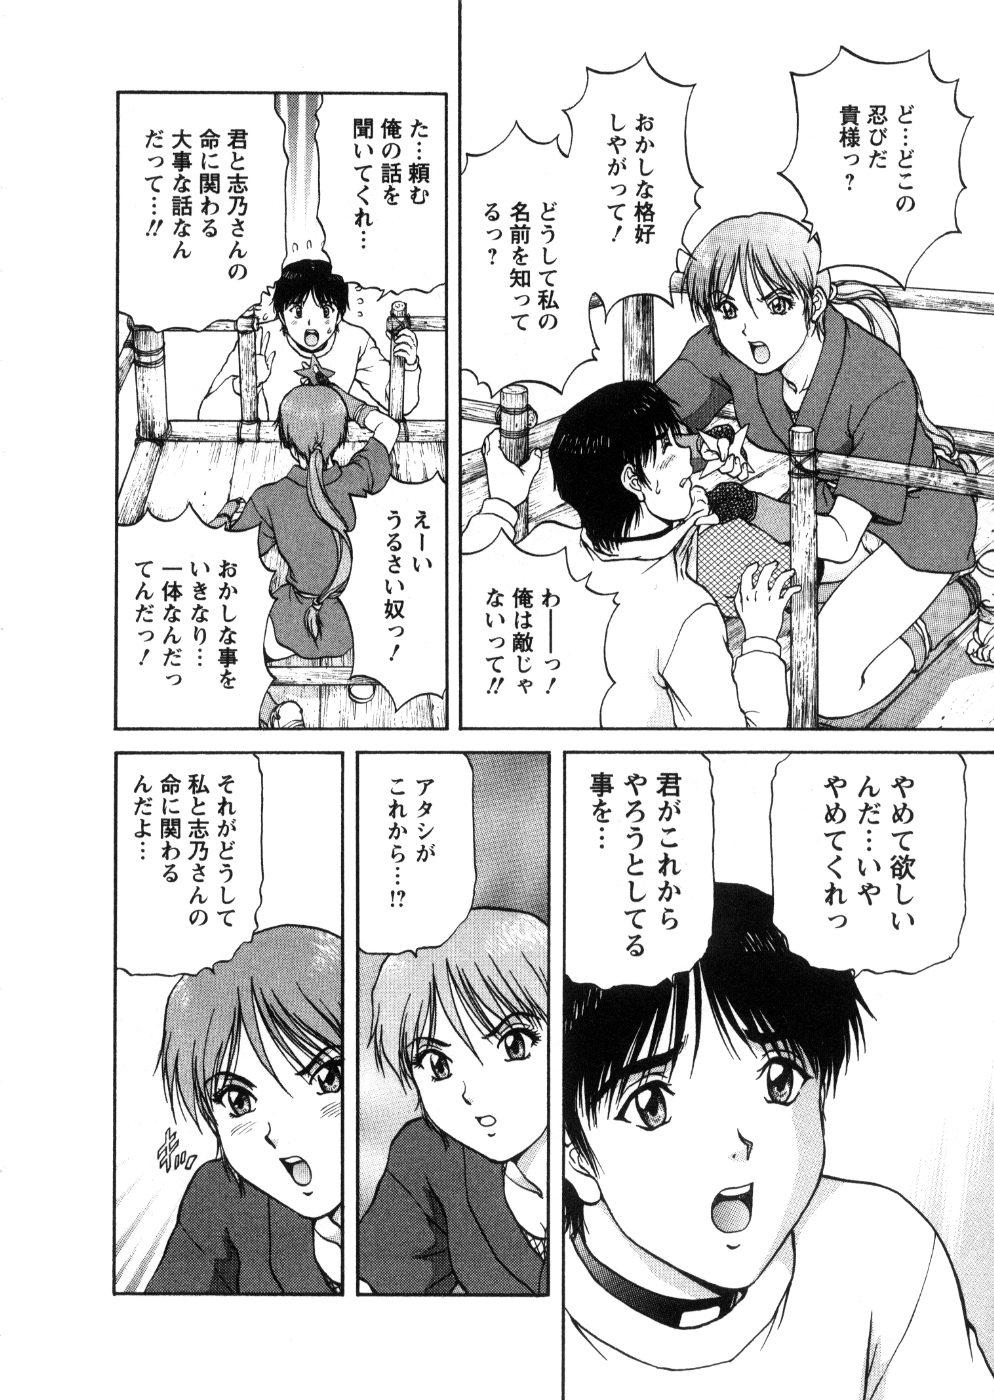 Oneechan-tachi ga Yatte Kuru 03 37